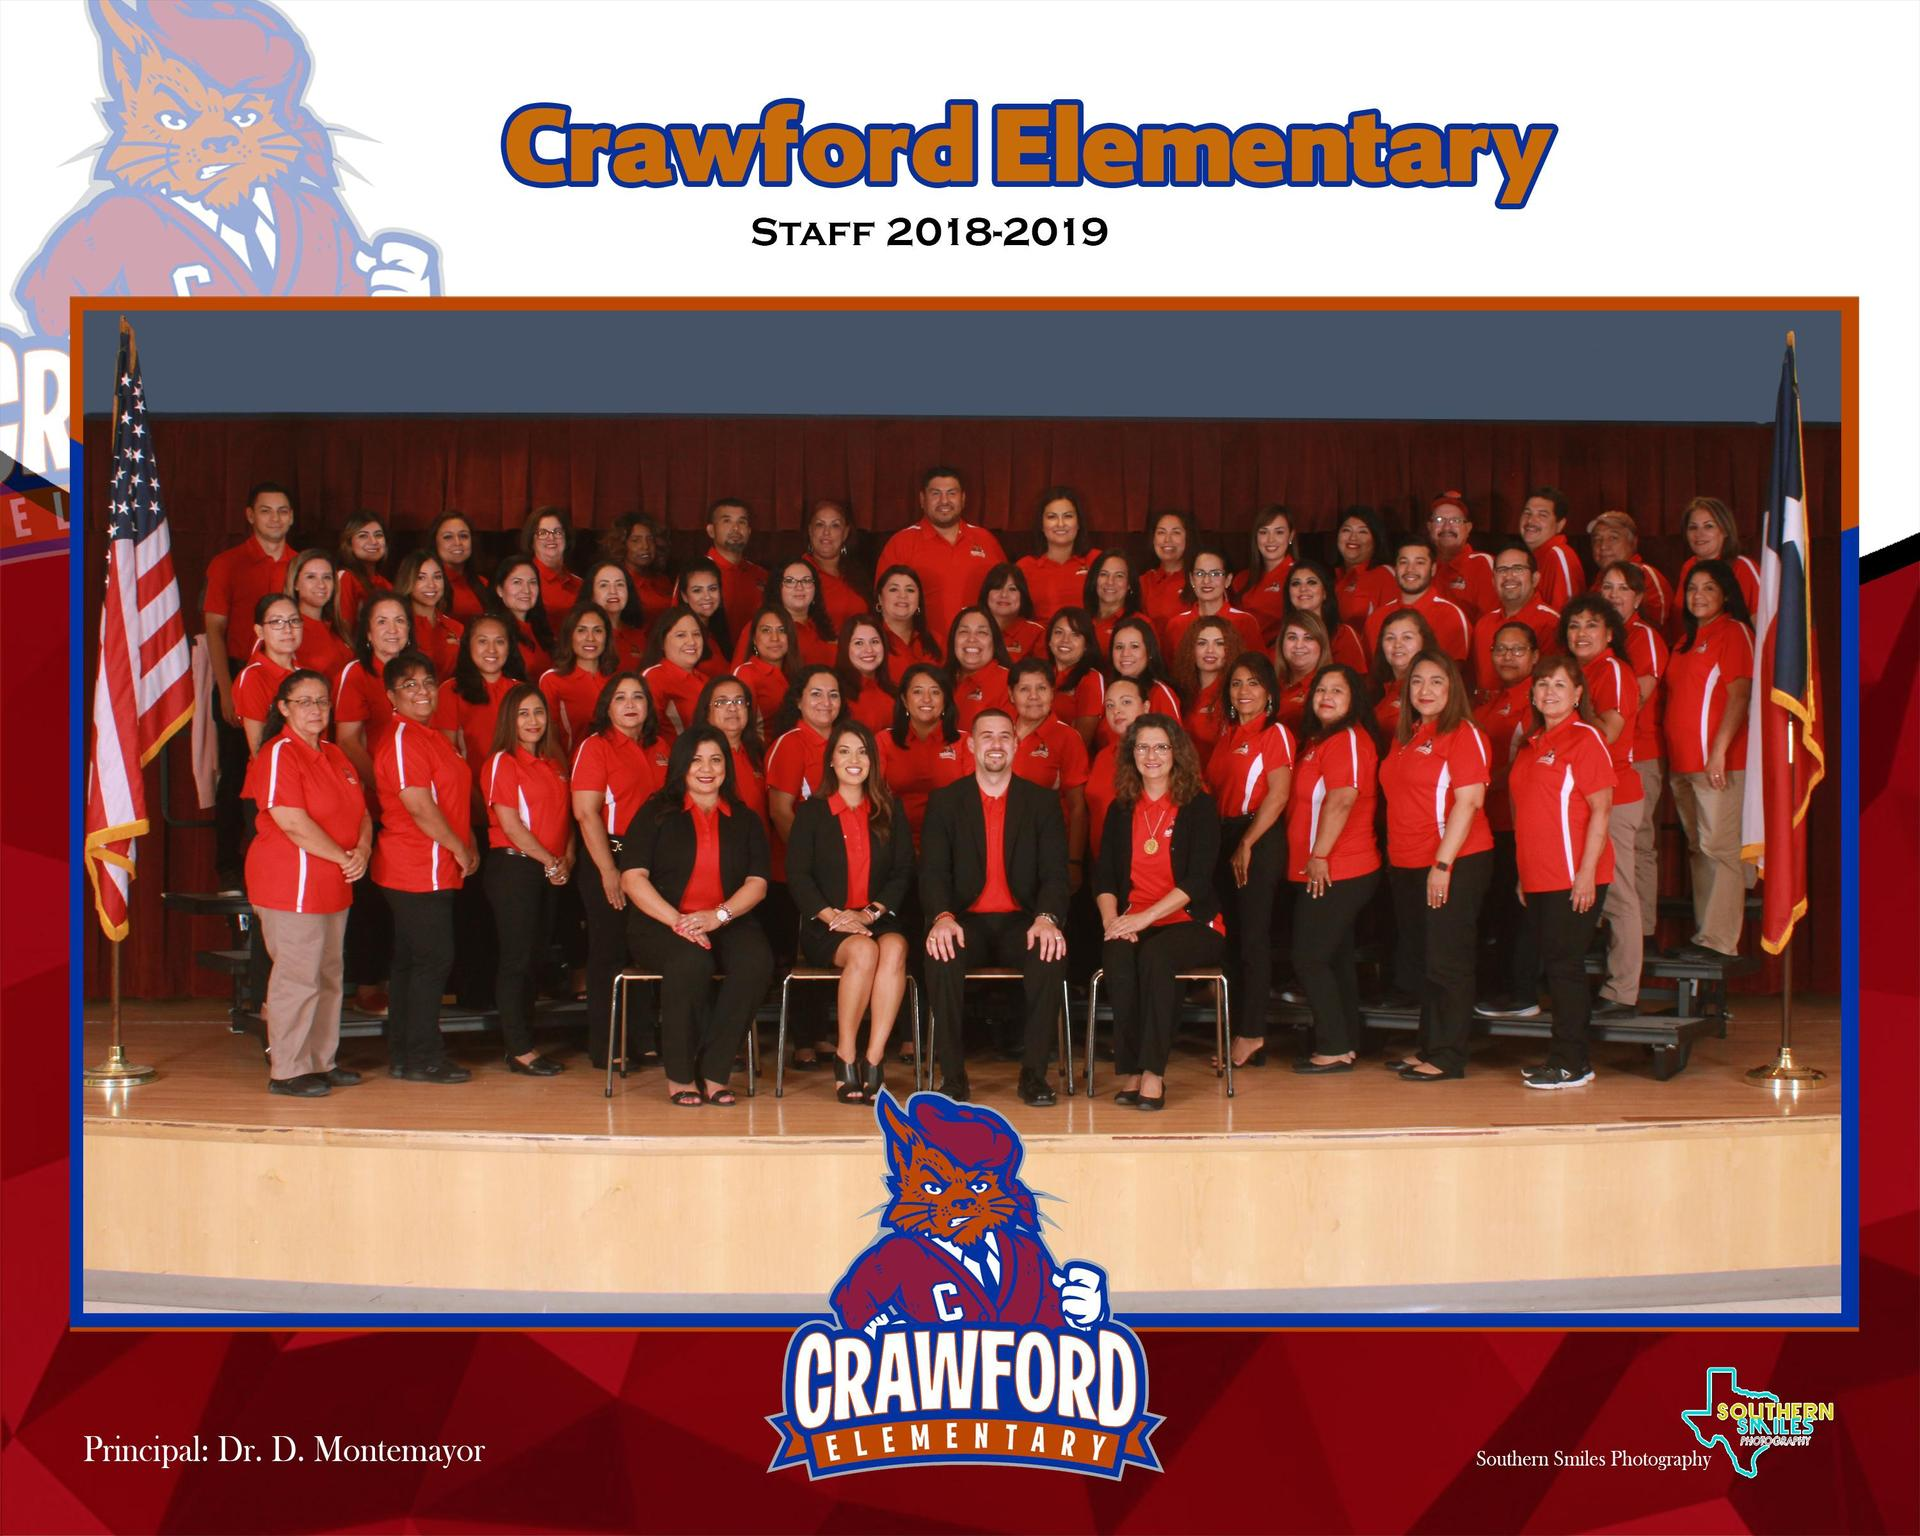 Photo of all Crawford Elementary School staff